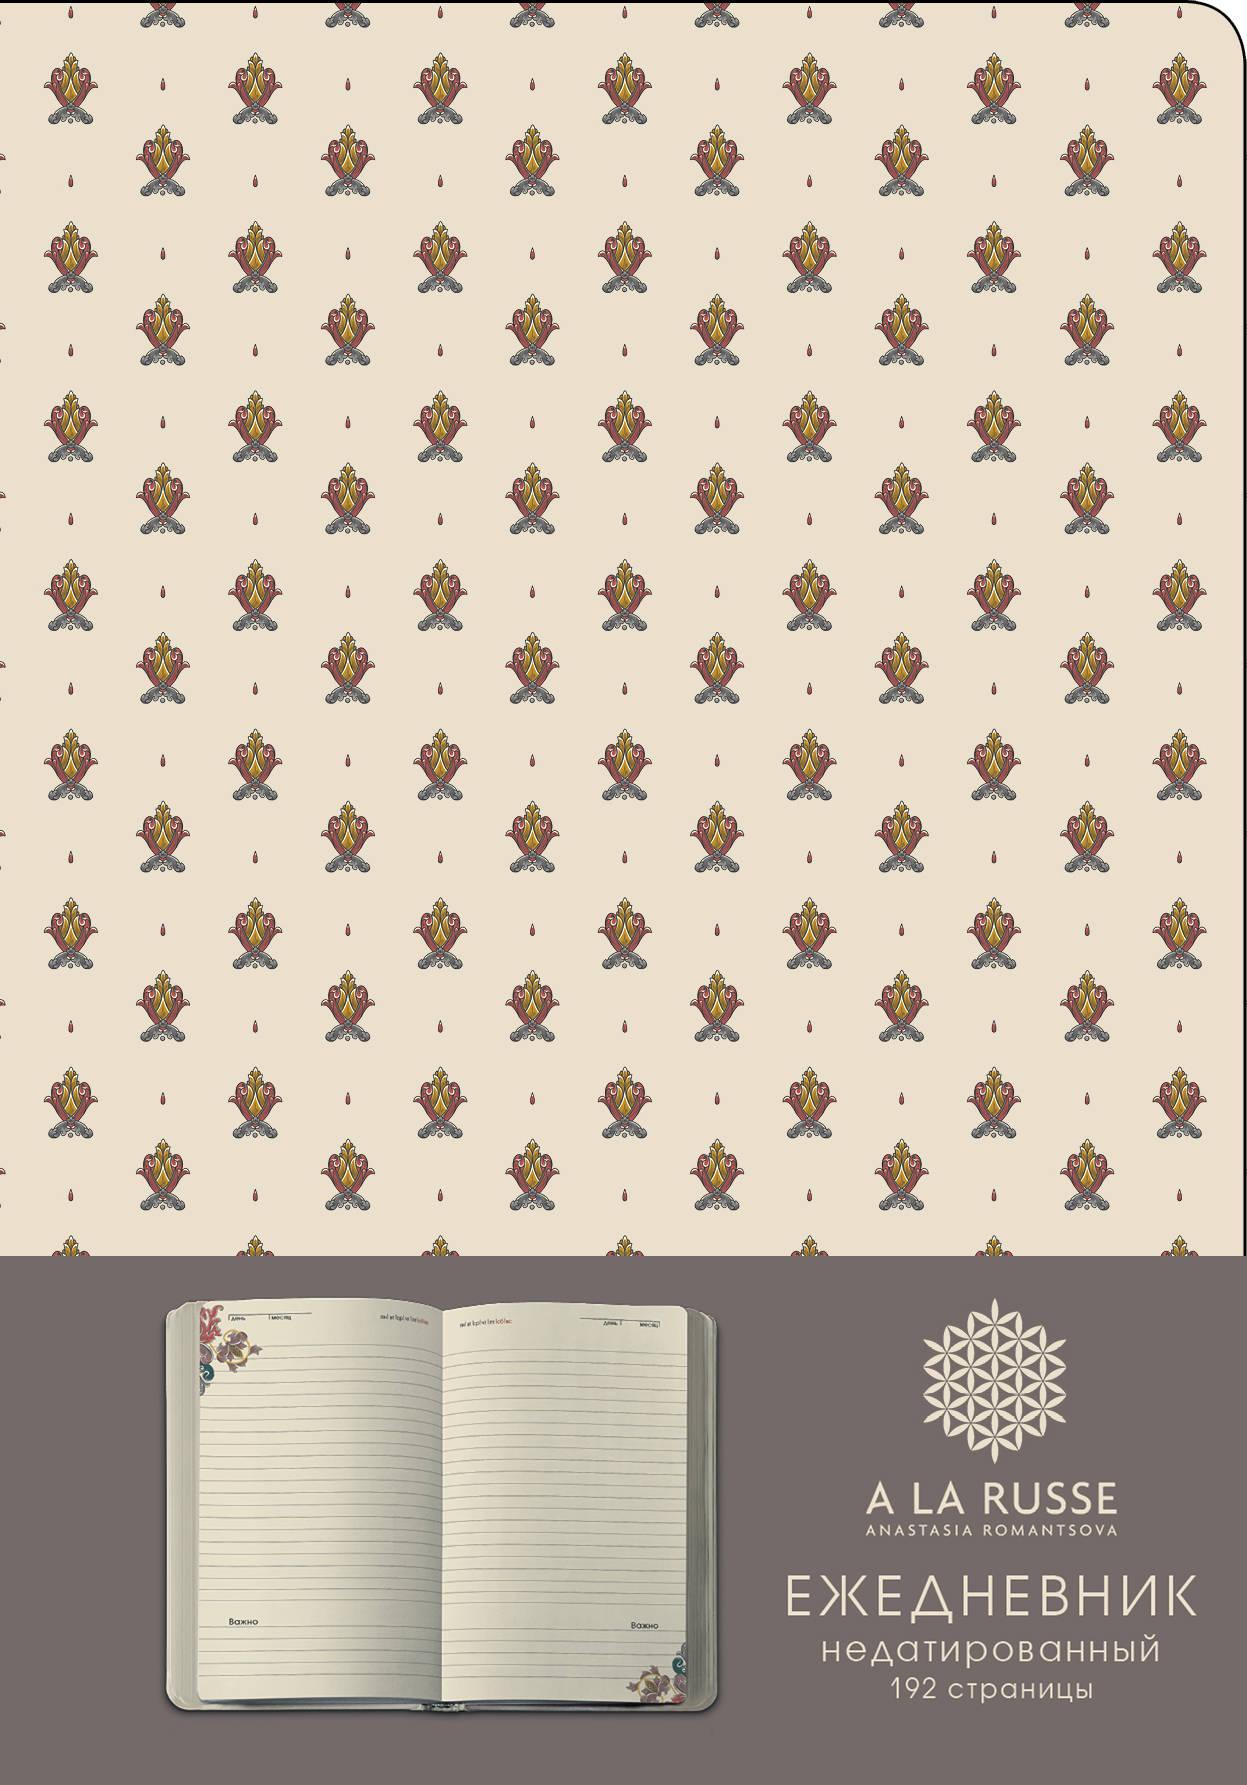 цена Ежедневник A LA RUSSE. Мелкий орнамент (формат А5, недатированный) (Арте) онлайн в 2017 году